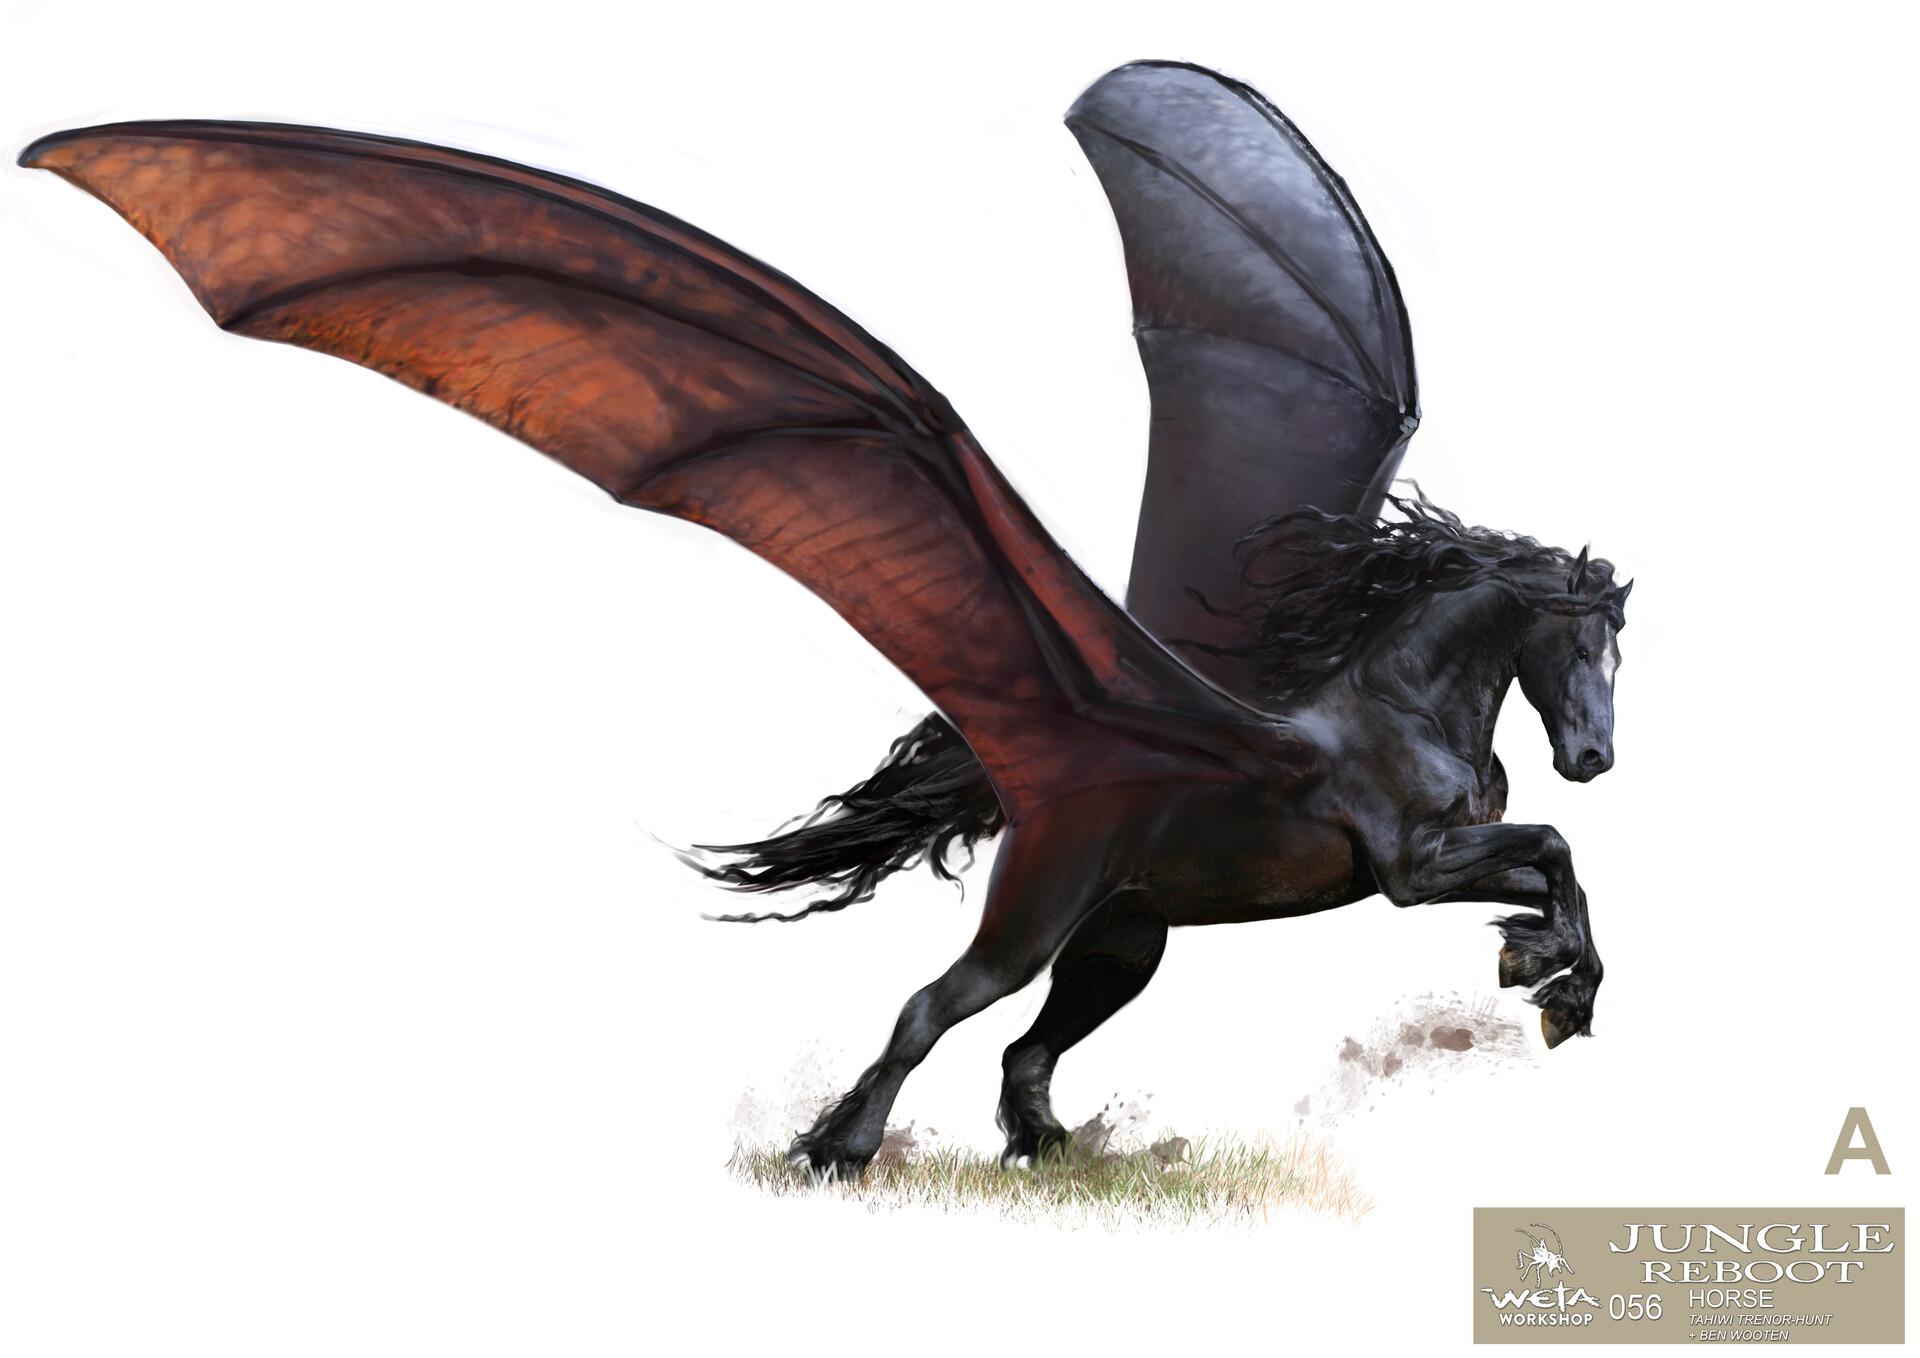 Weta workshop design studio 056 jr horse open wings 02 tth